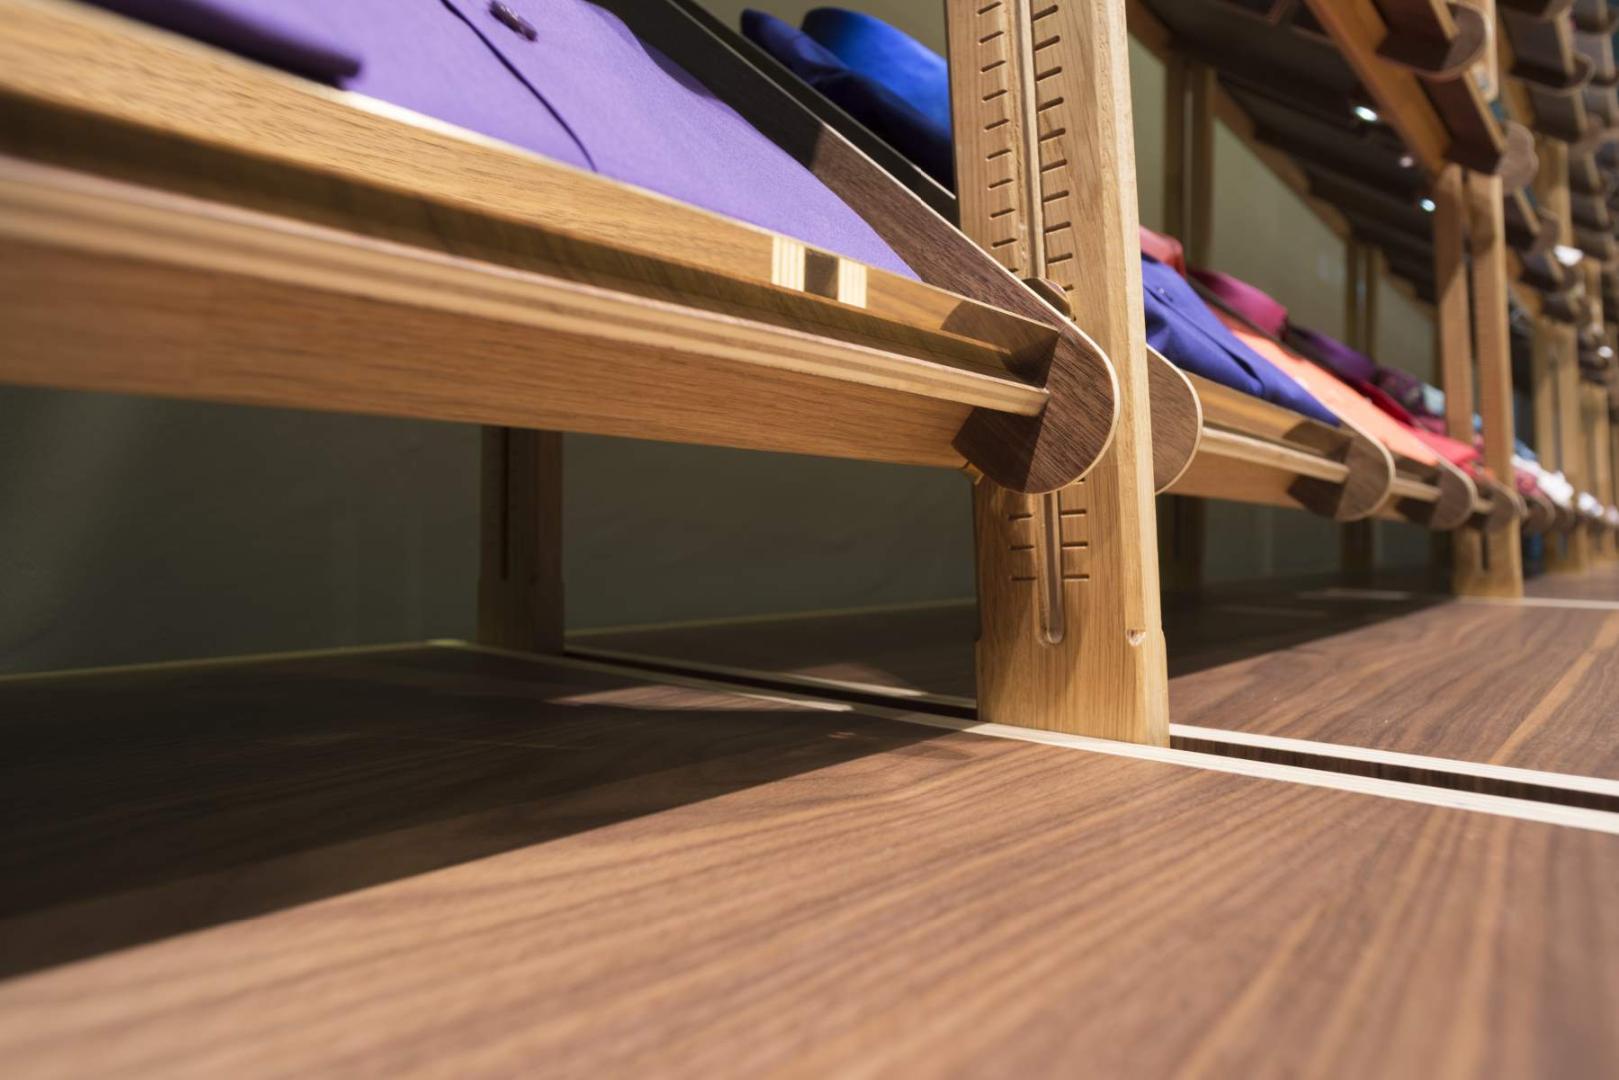 Braiconf magazin shop marriott mobilier lemn masiv furnir design dinamic024